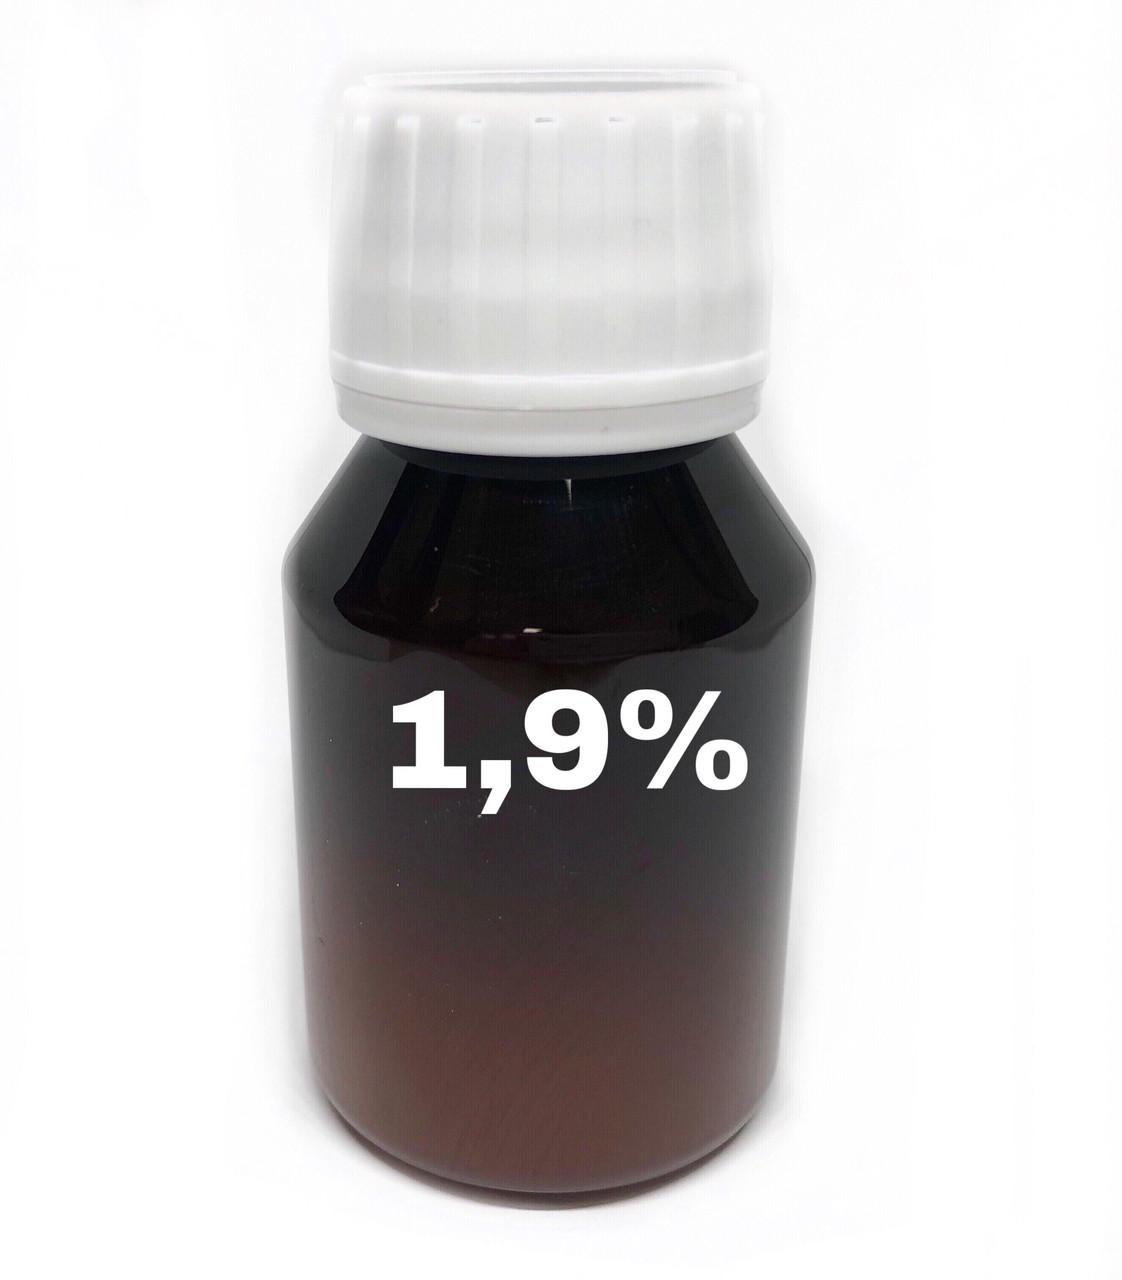 Гель активирующий 1.9% Schwarzkopf Igora Vibrance (разлив) 60 мл